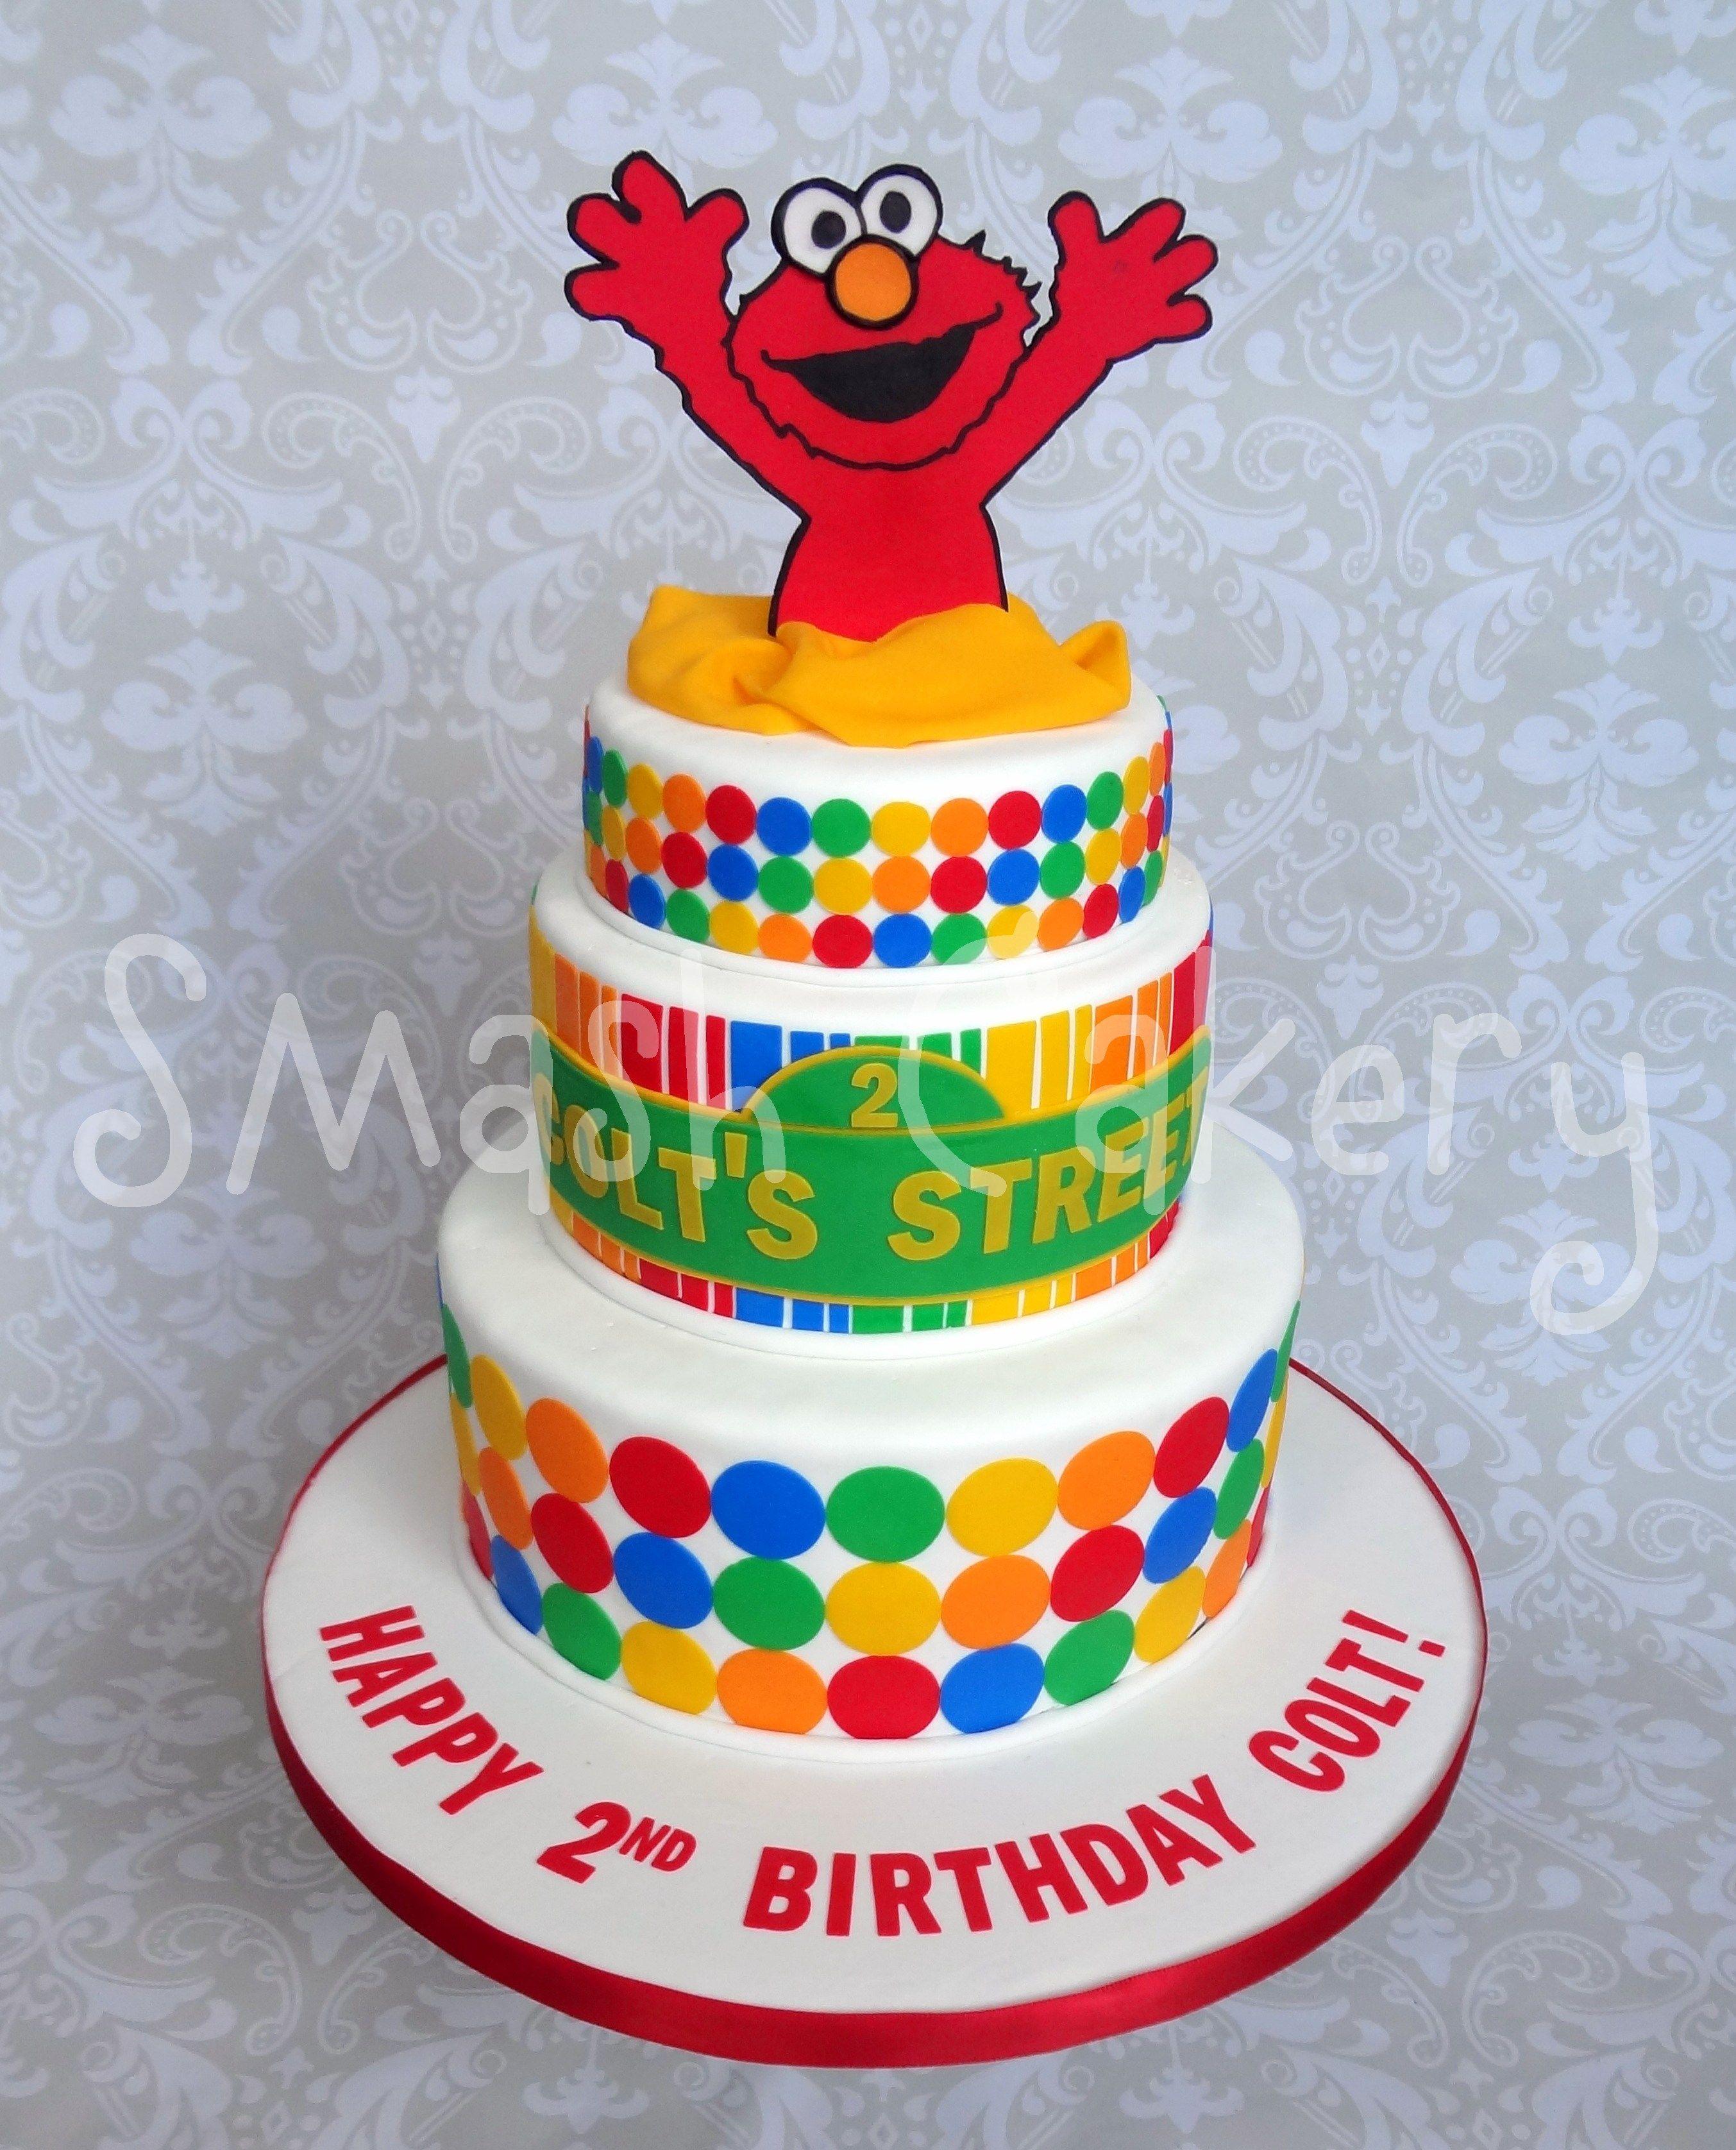 Elmo Birthday Cake This design was inspired by Jessica Harris